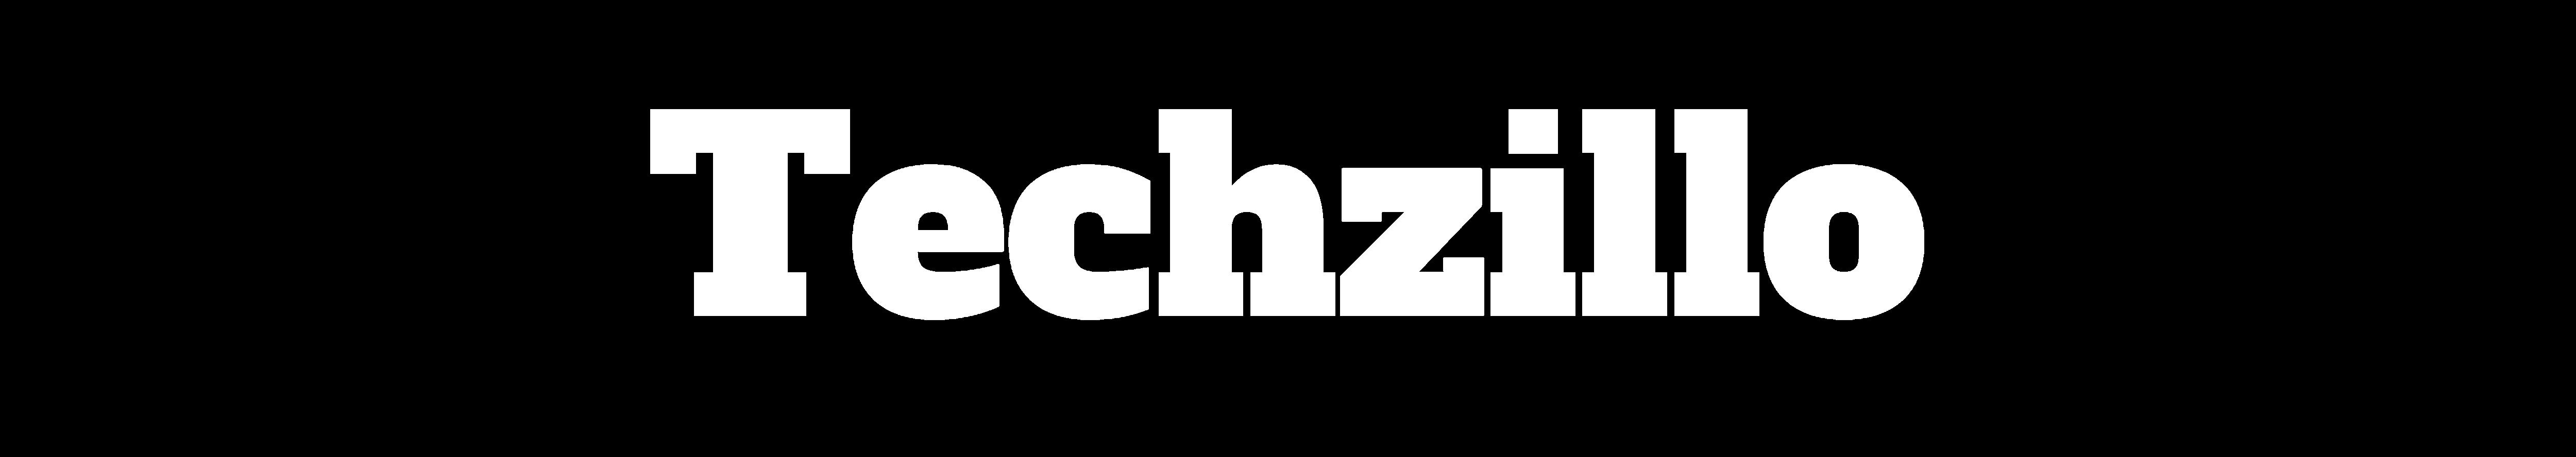 4 ways to Fix When Spotify Shuffle is Not Random - Techzillo